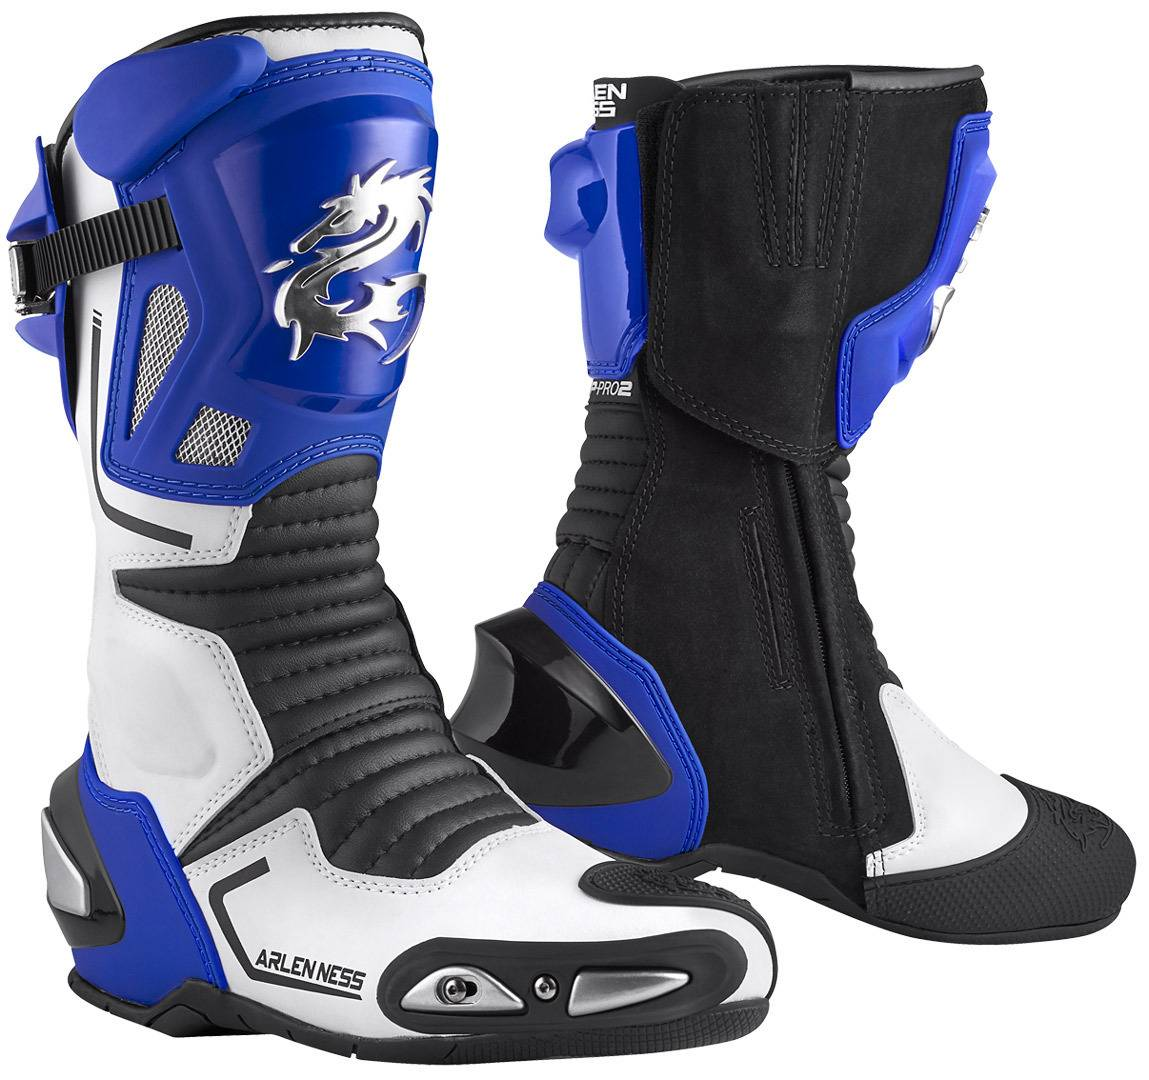 Arlen Ness Sugello Bottes de moto Noir Blanc Bleu taille : 43